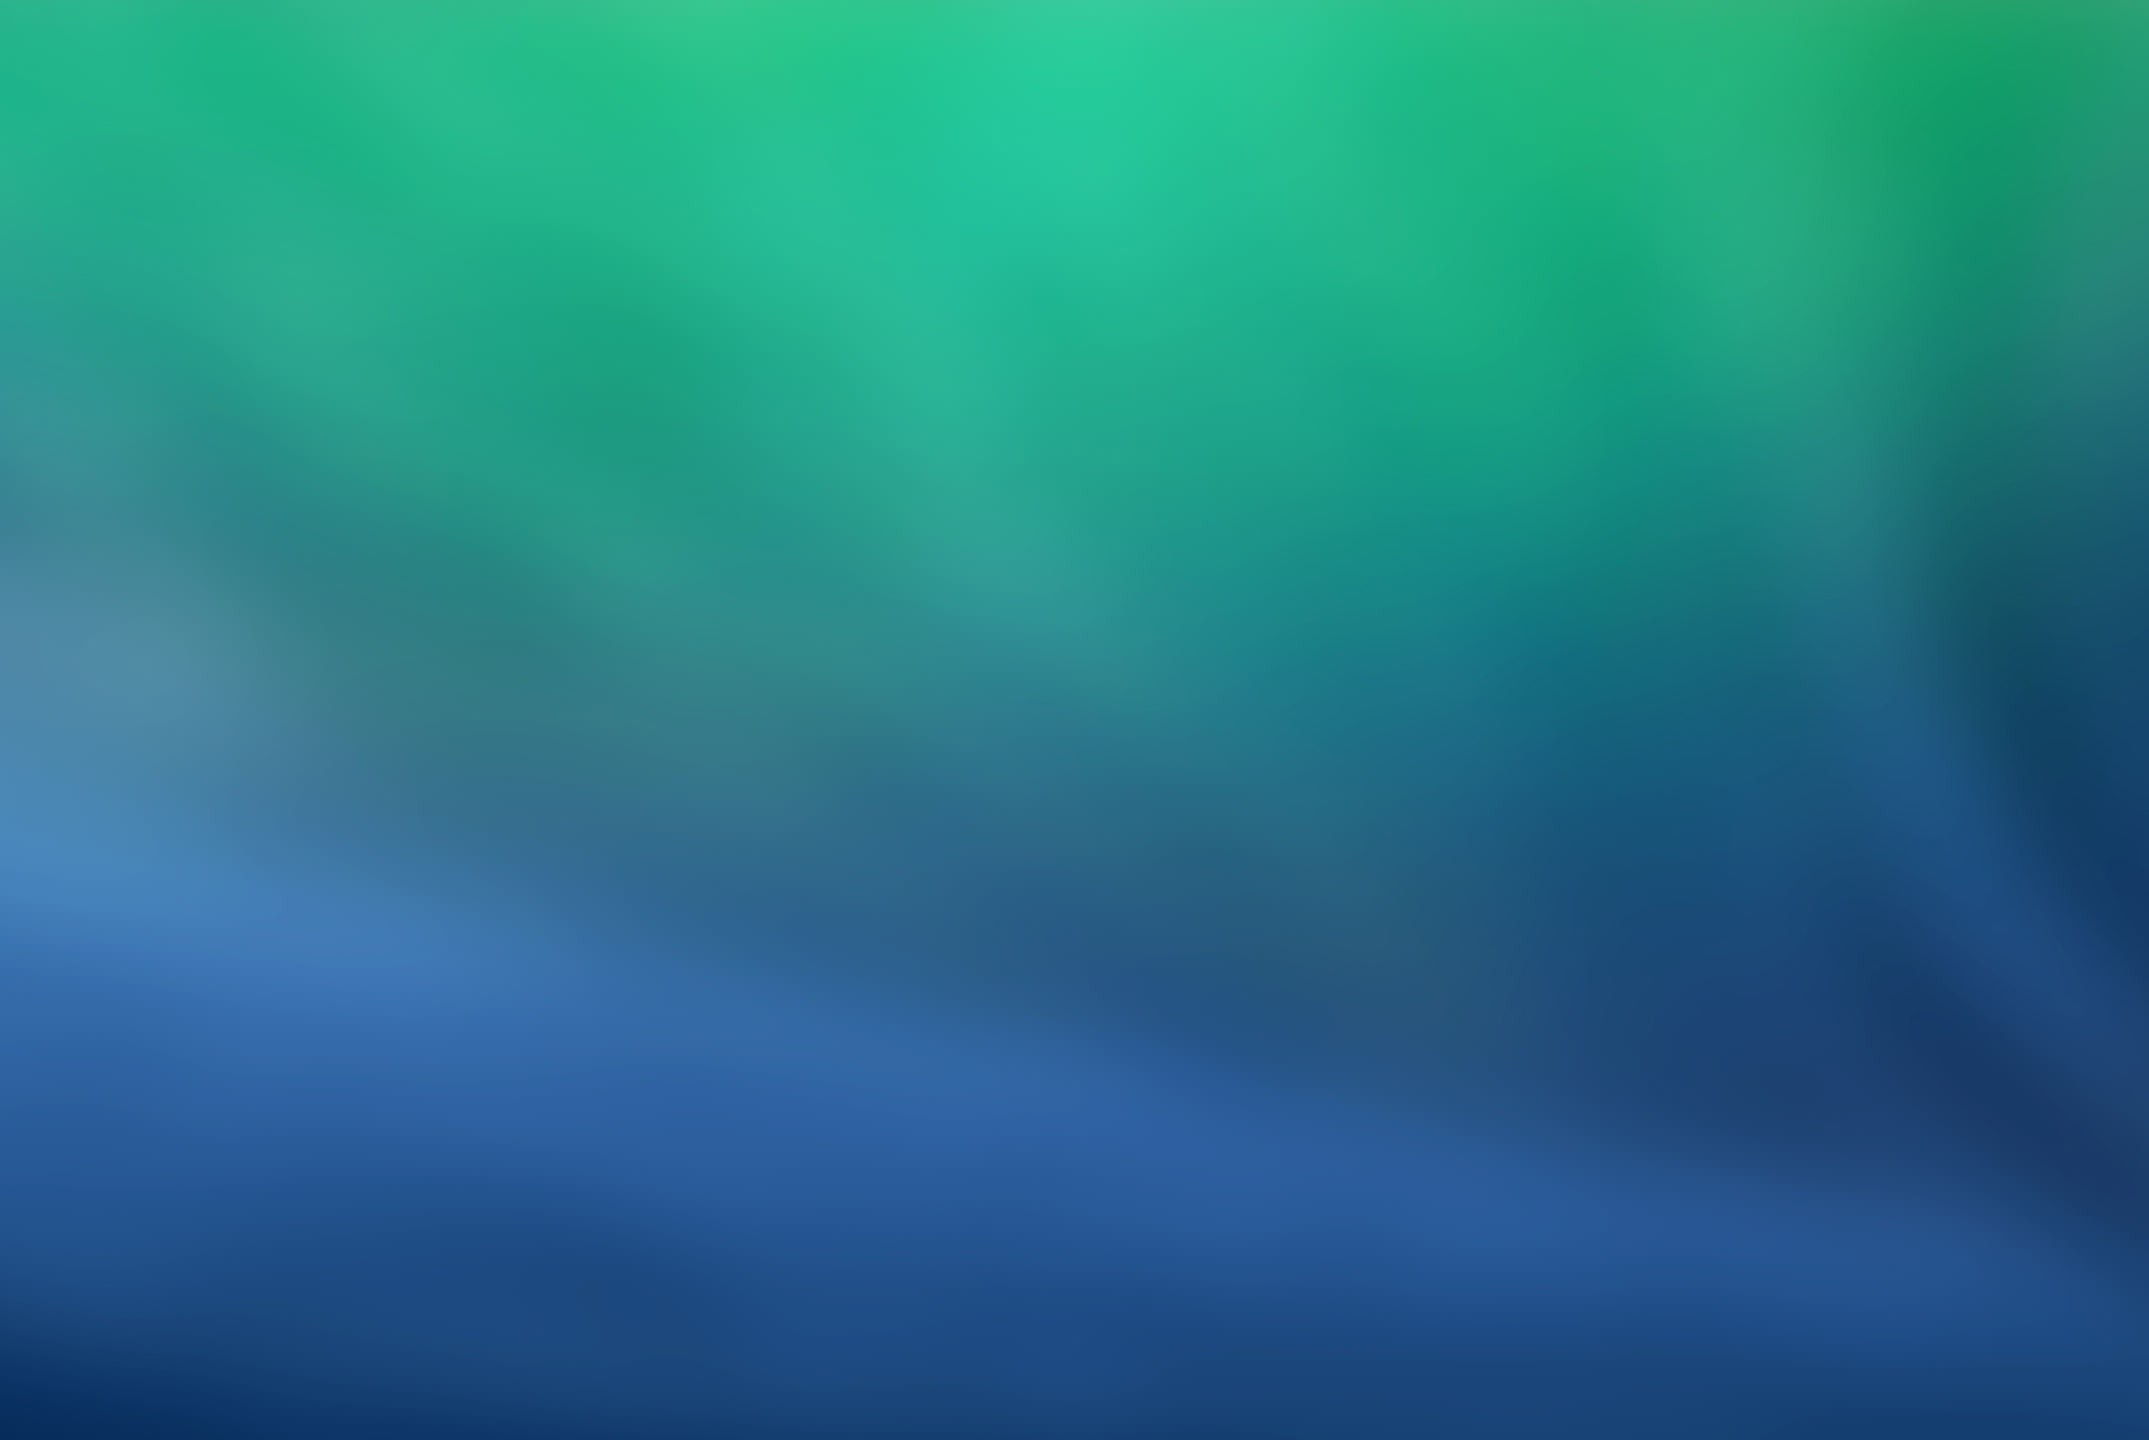 Blue Green background  Download free beautiful HD